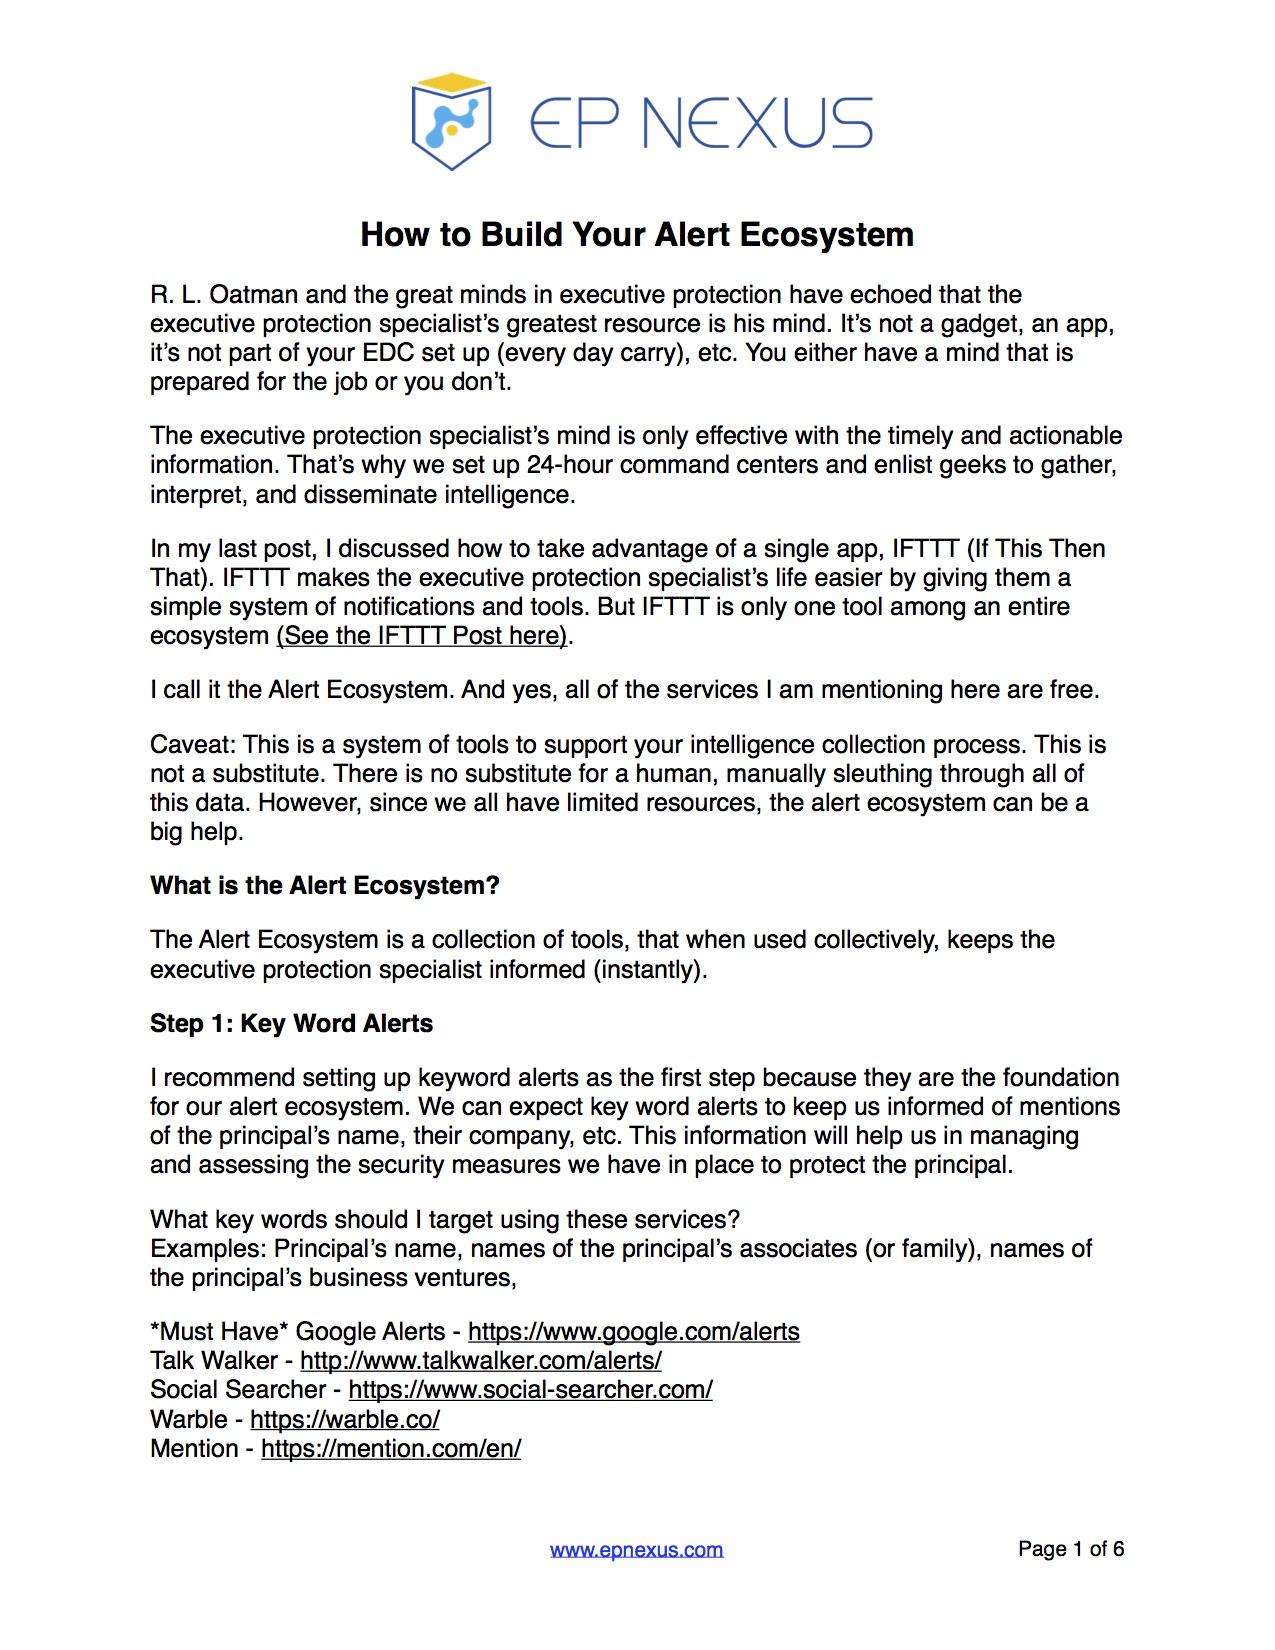 PG 1 - Executive Protection Alert Ecosystem